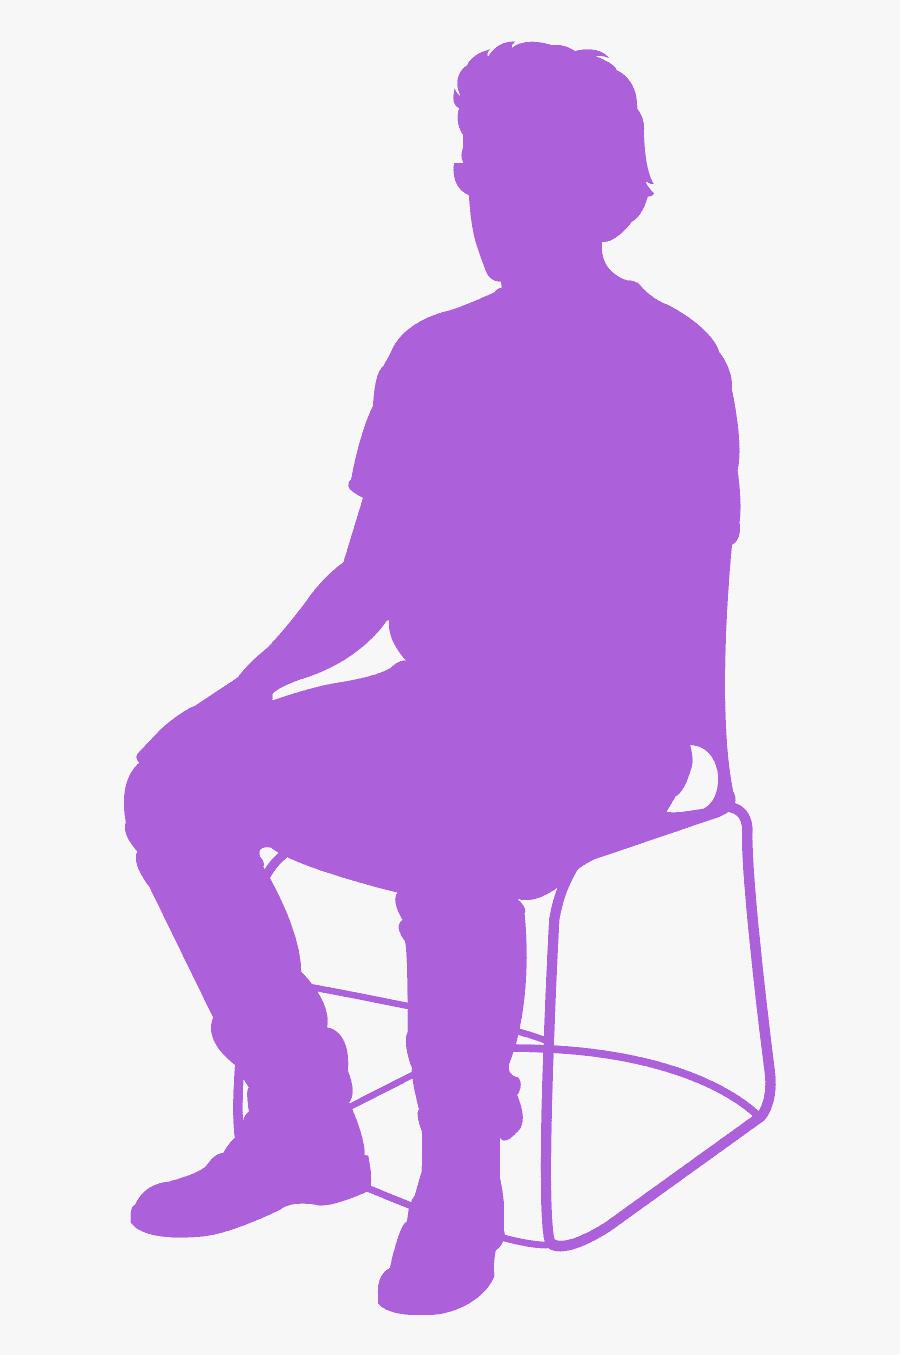 Silhouette, Transparent Clipart